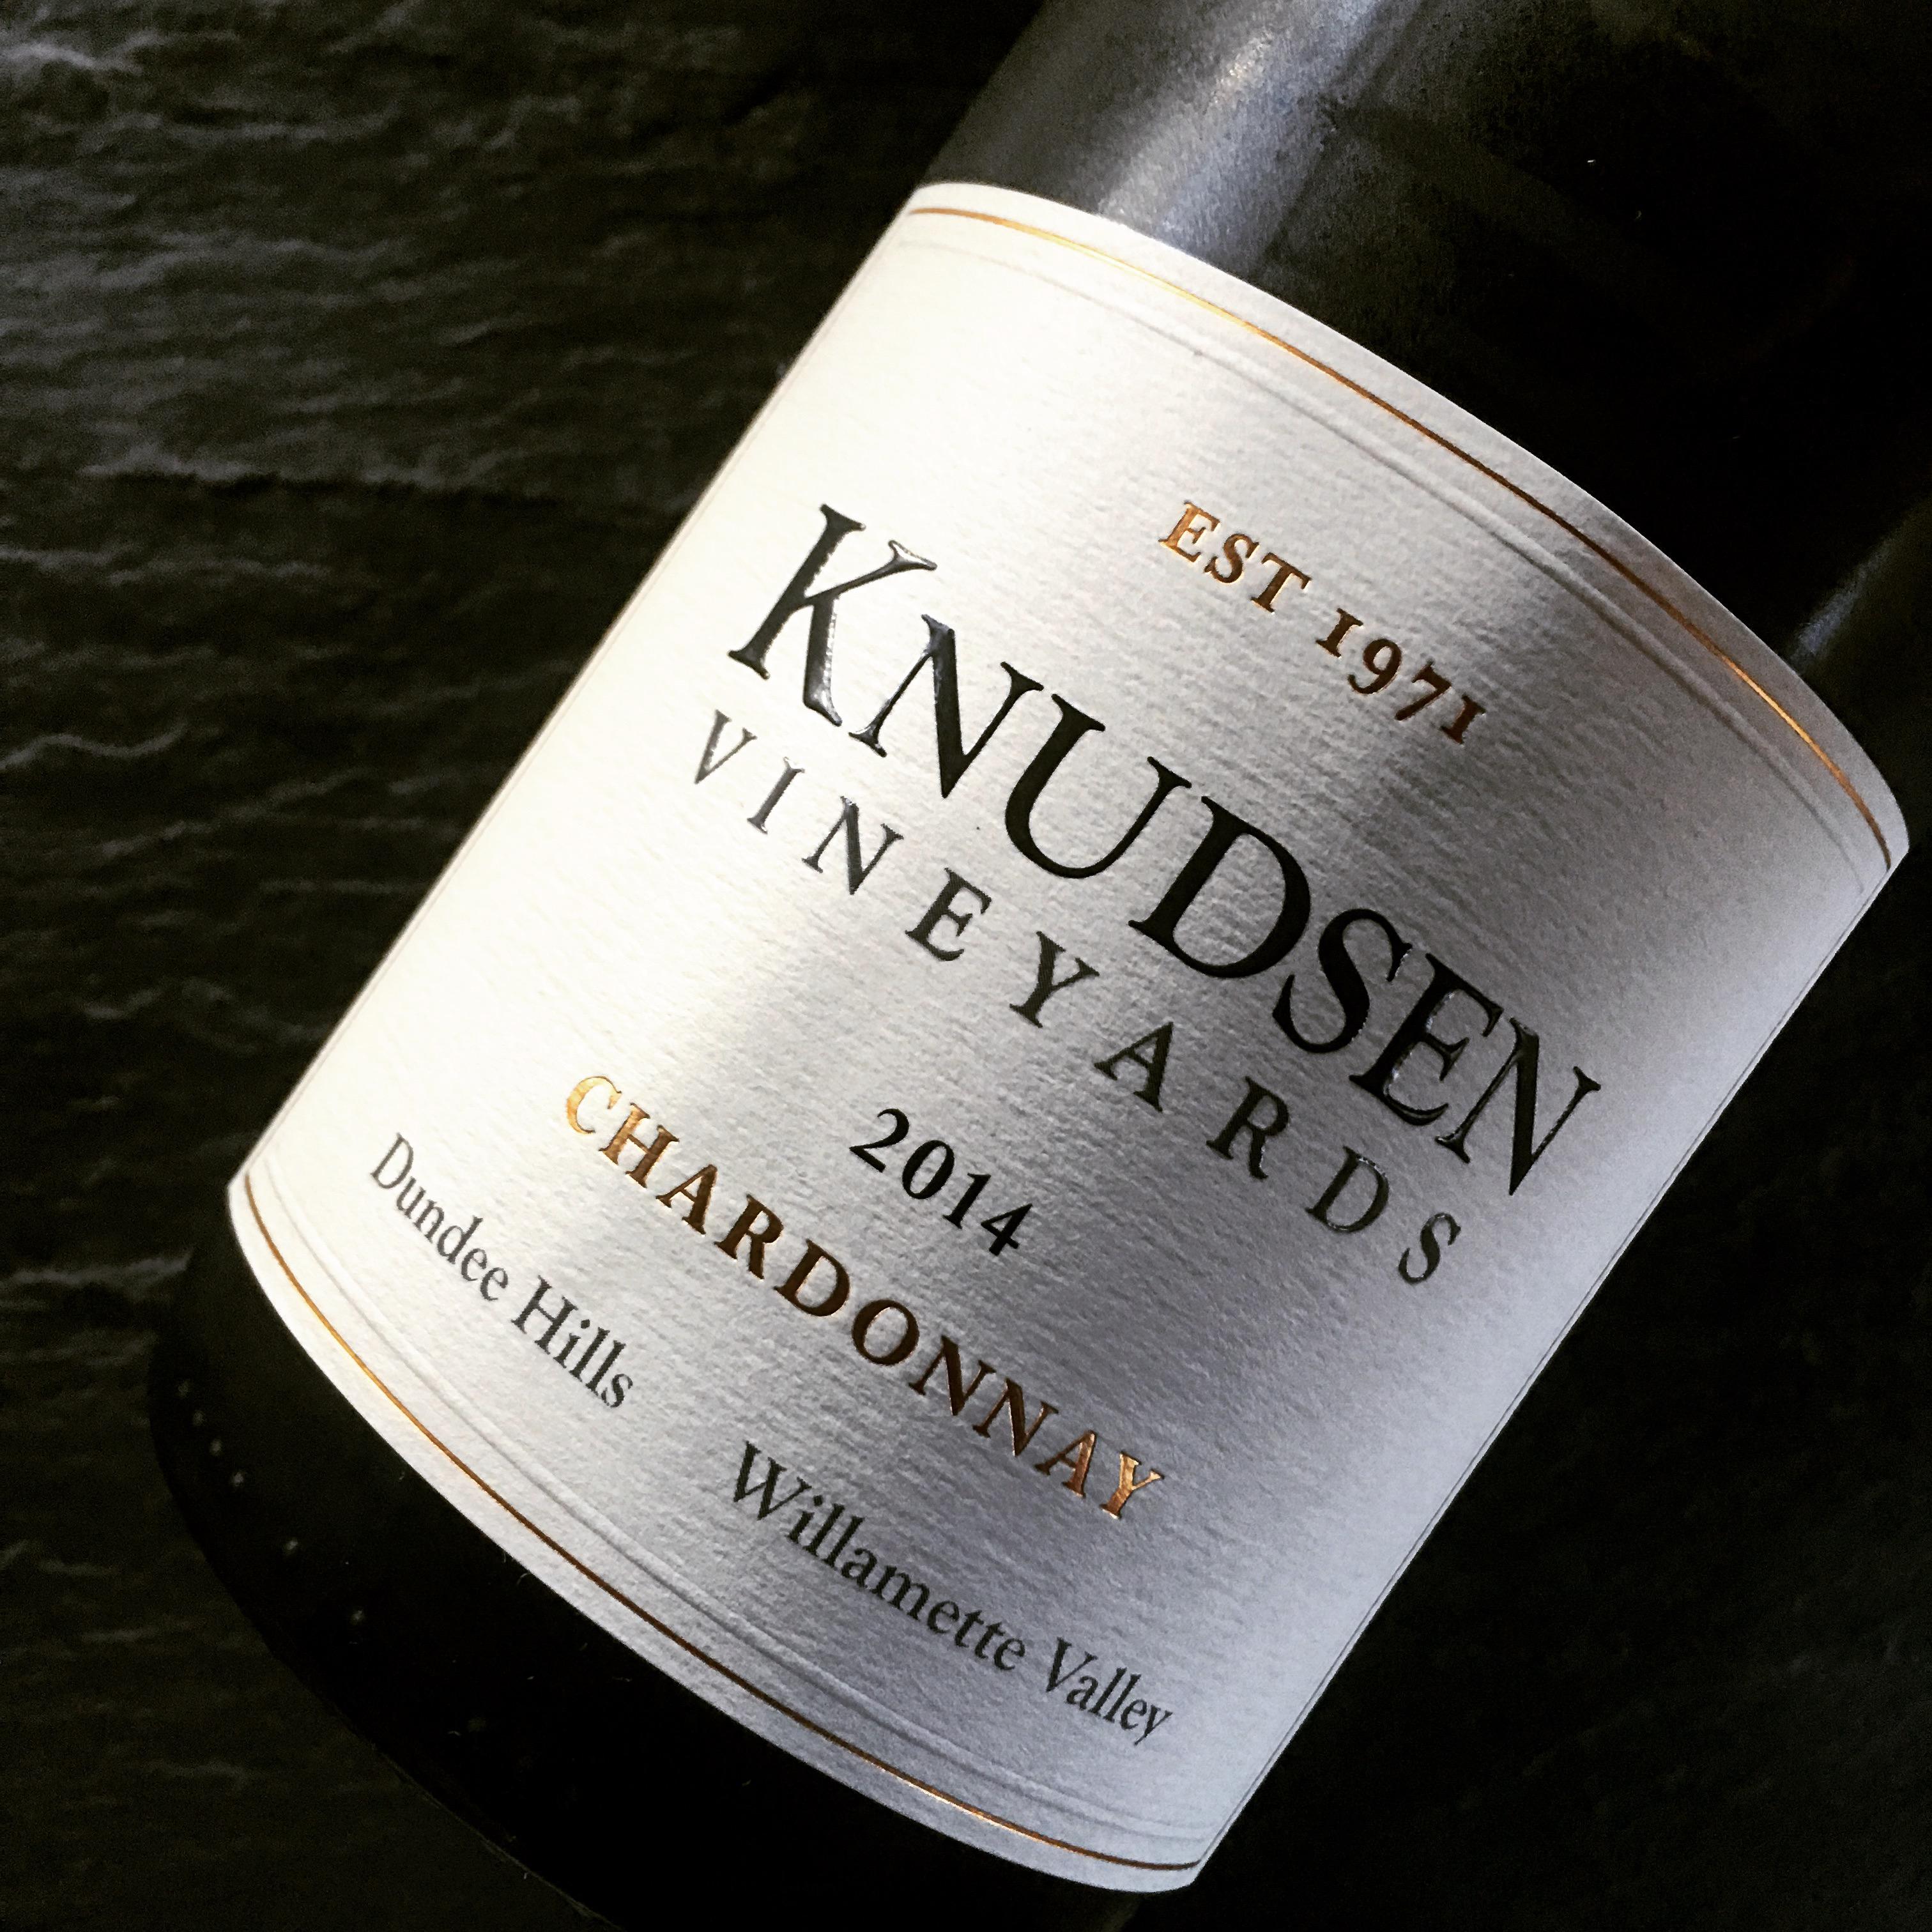 Knudsen Vineyards Dundee Hills Chardonnay 2014